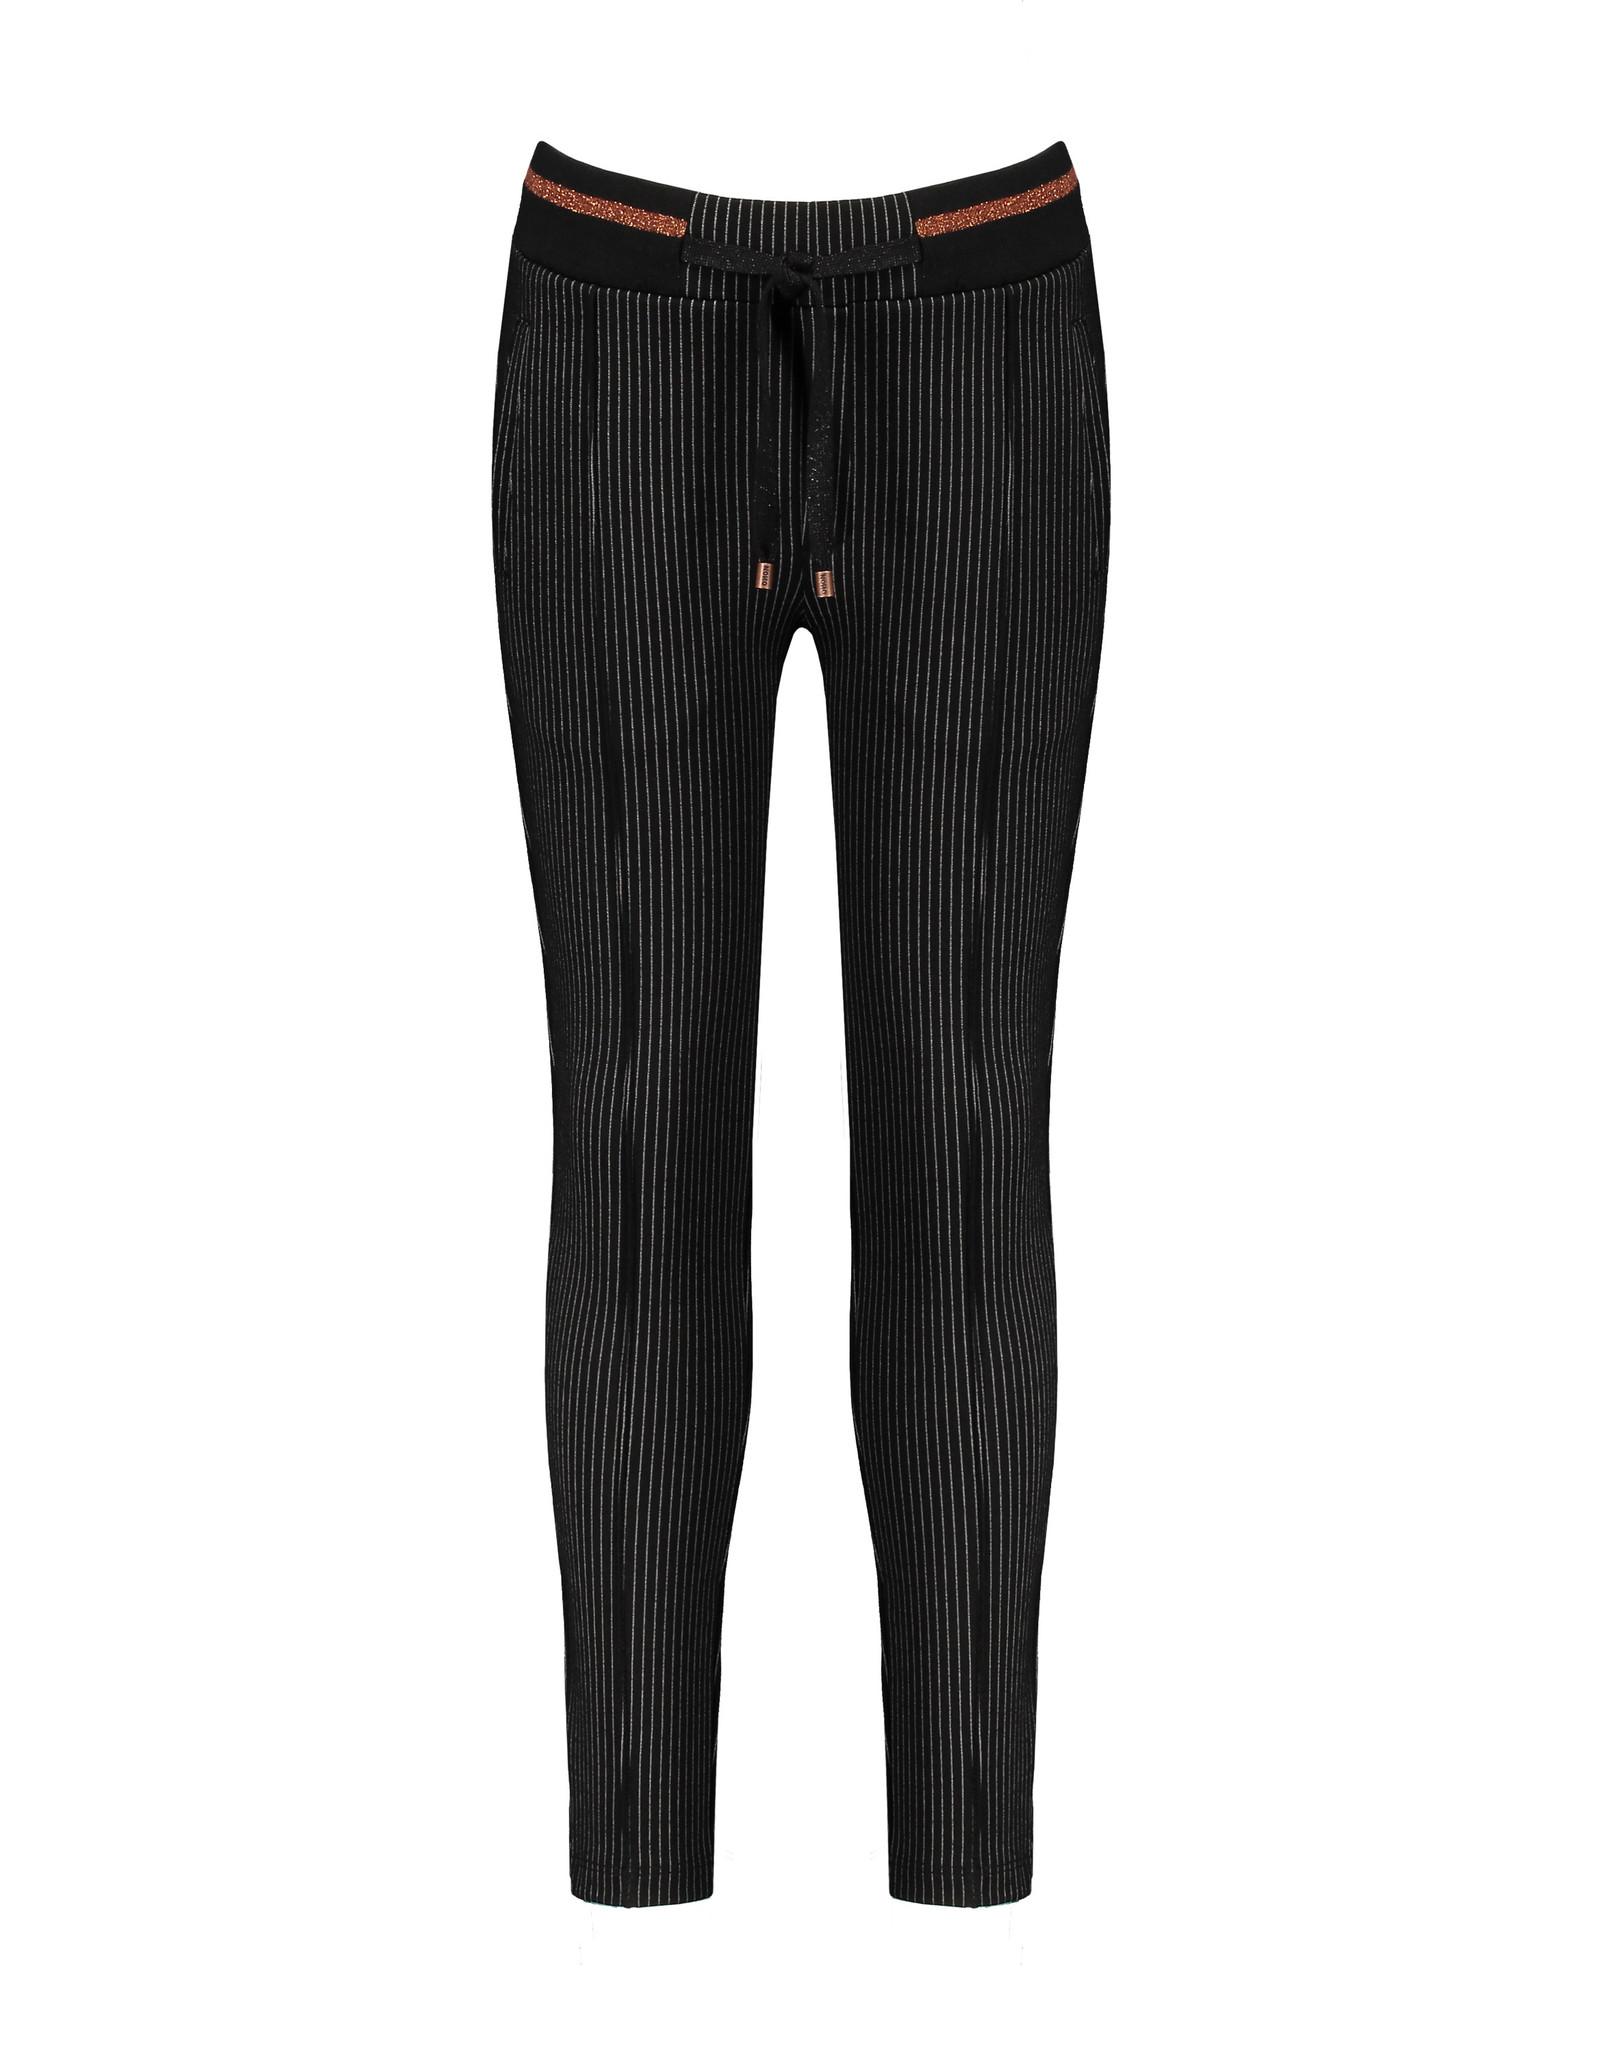 Nono Secler pinstriped pants